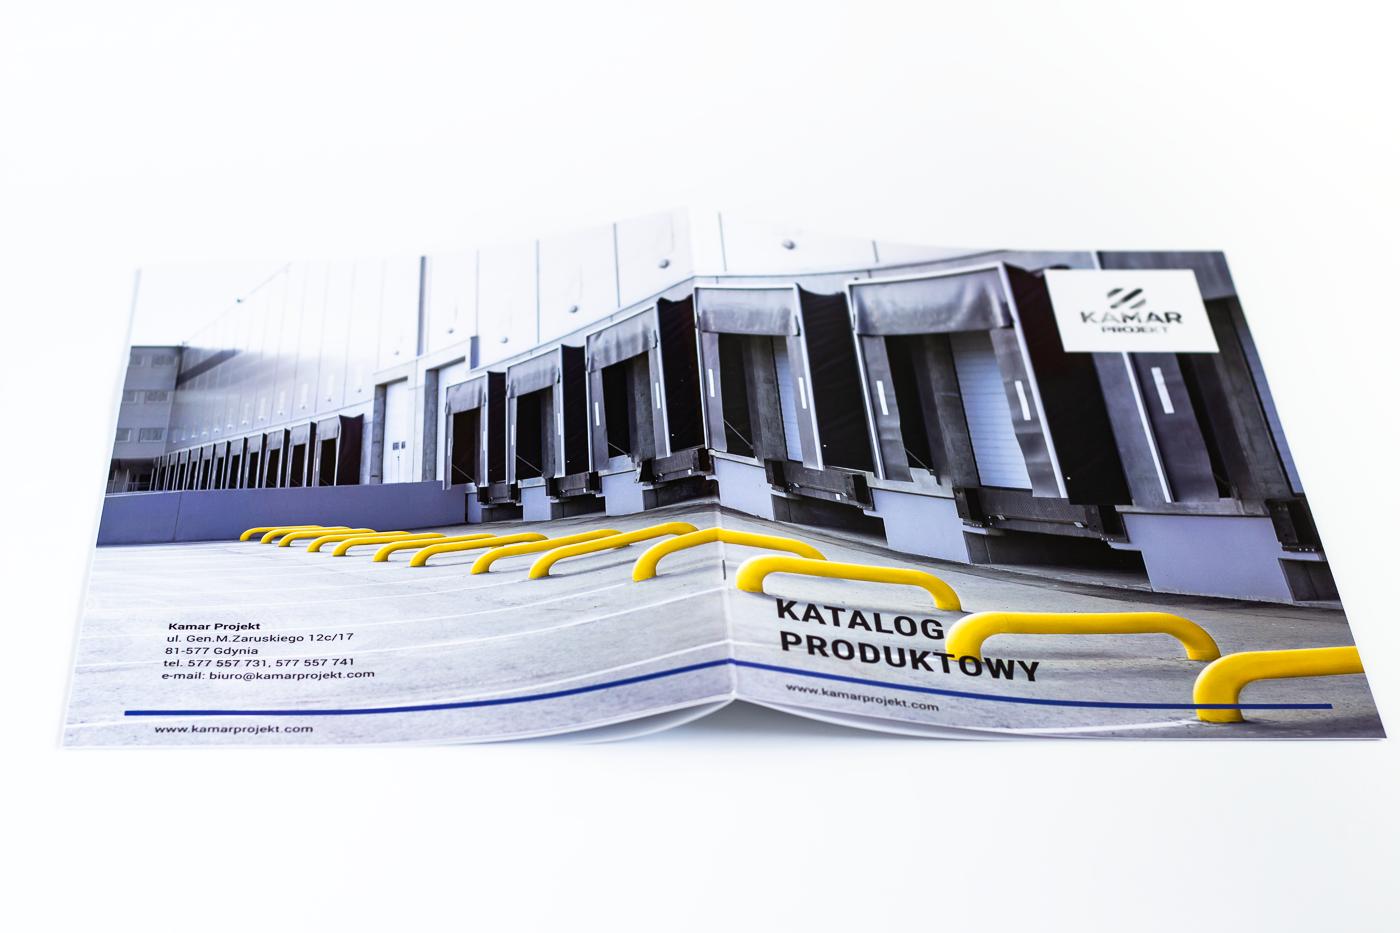 katalog produktowy okładka